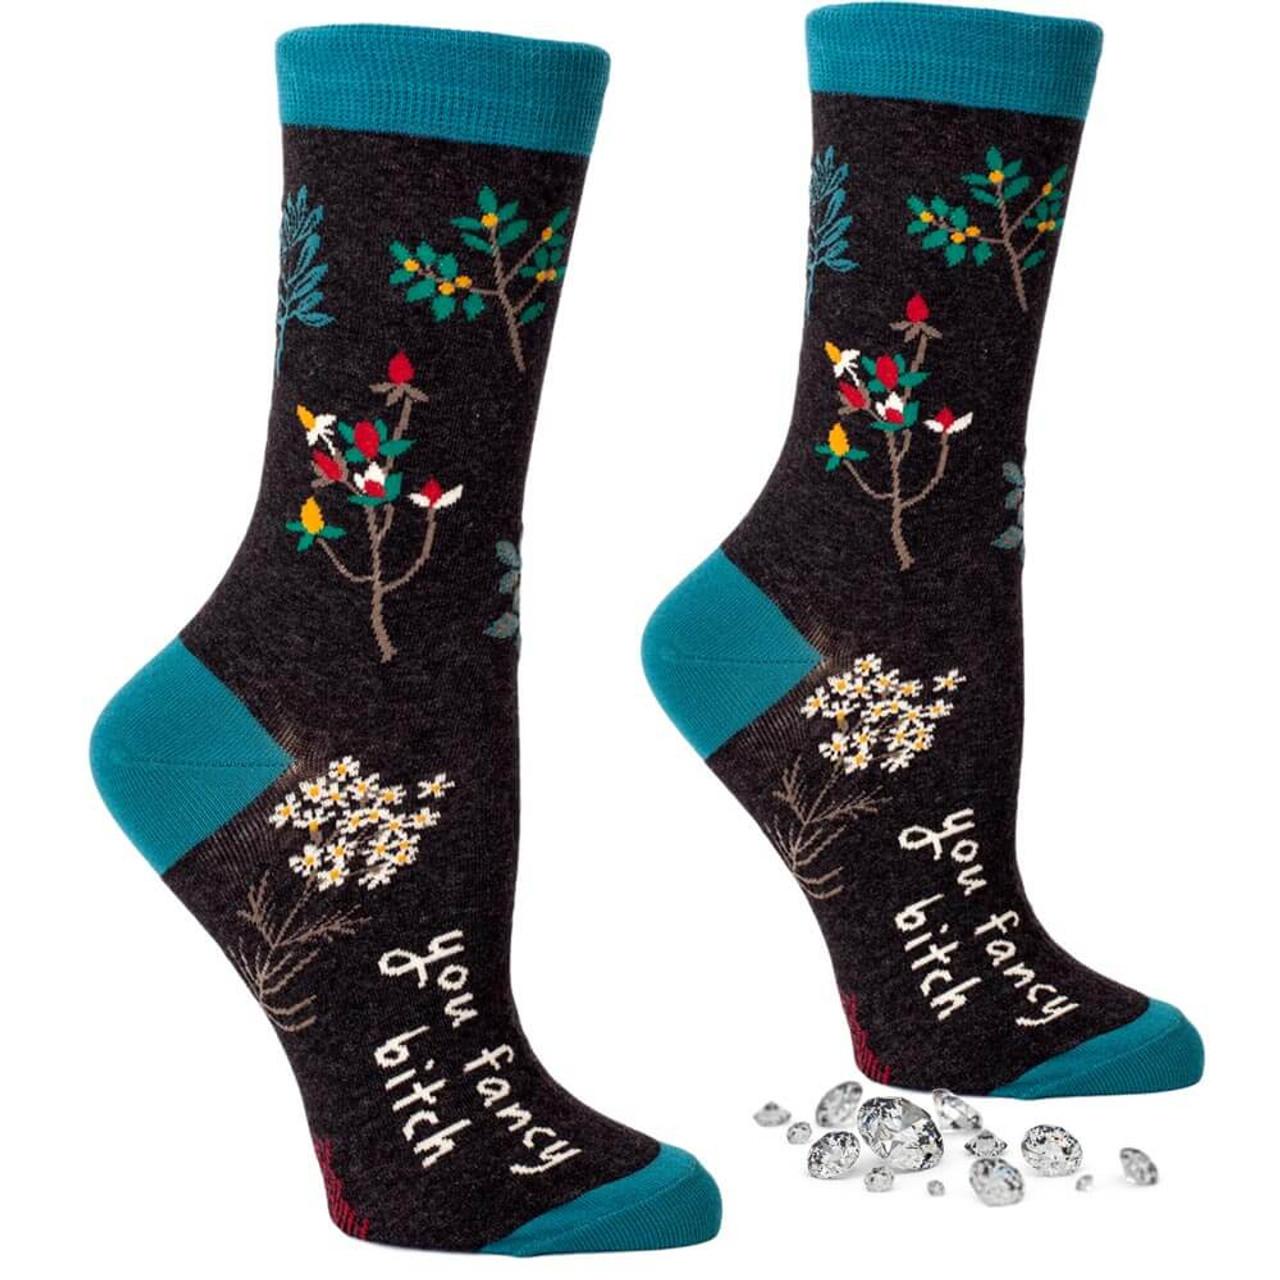 You Fancy B*tch Crew Socks